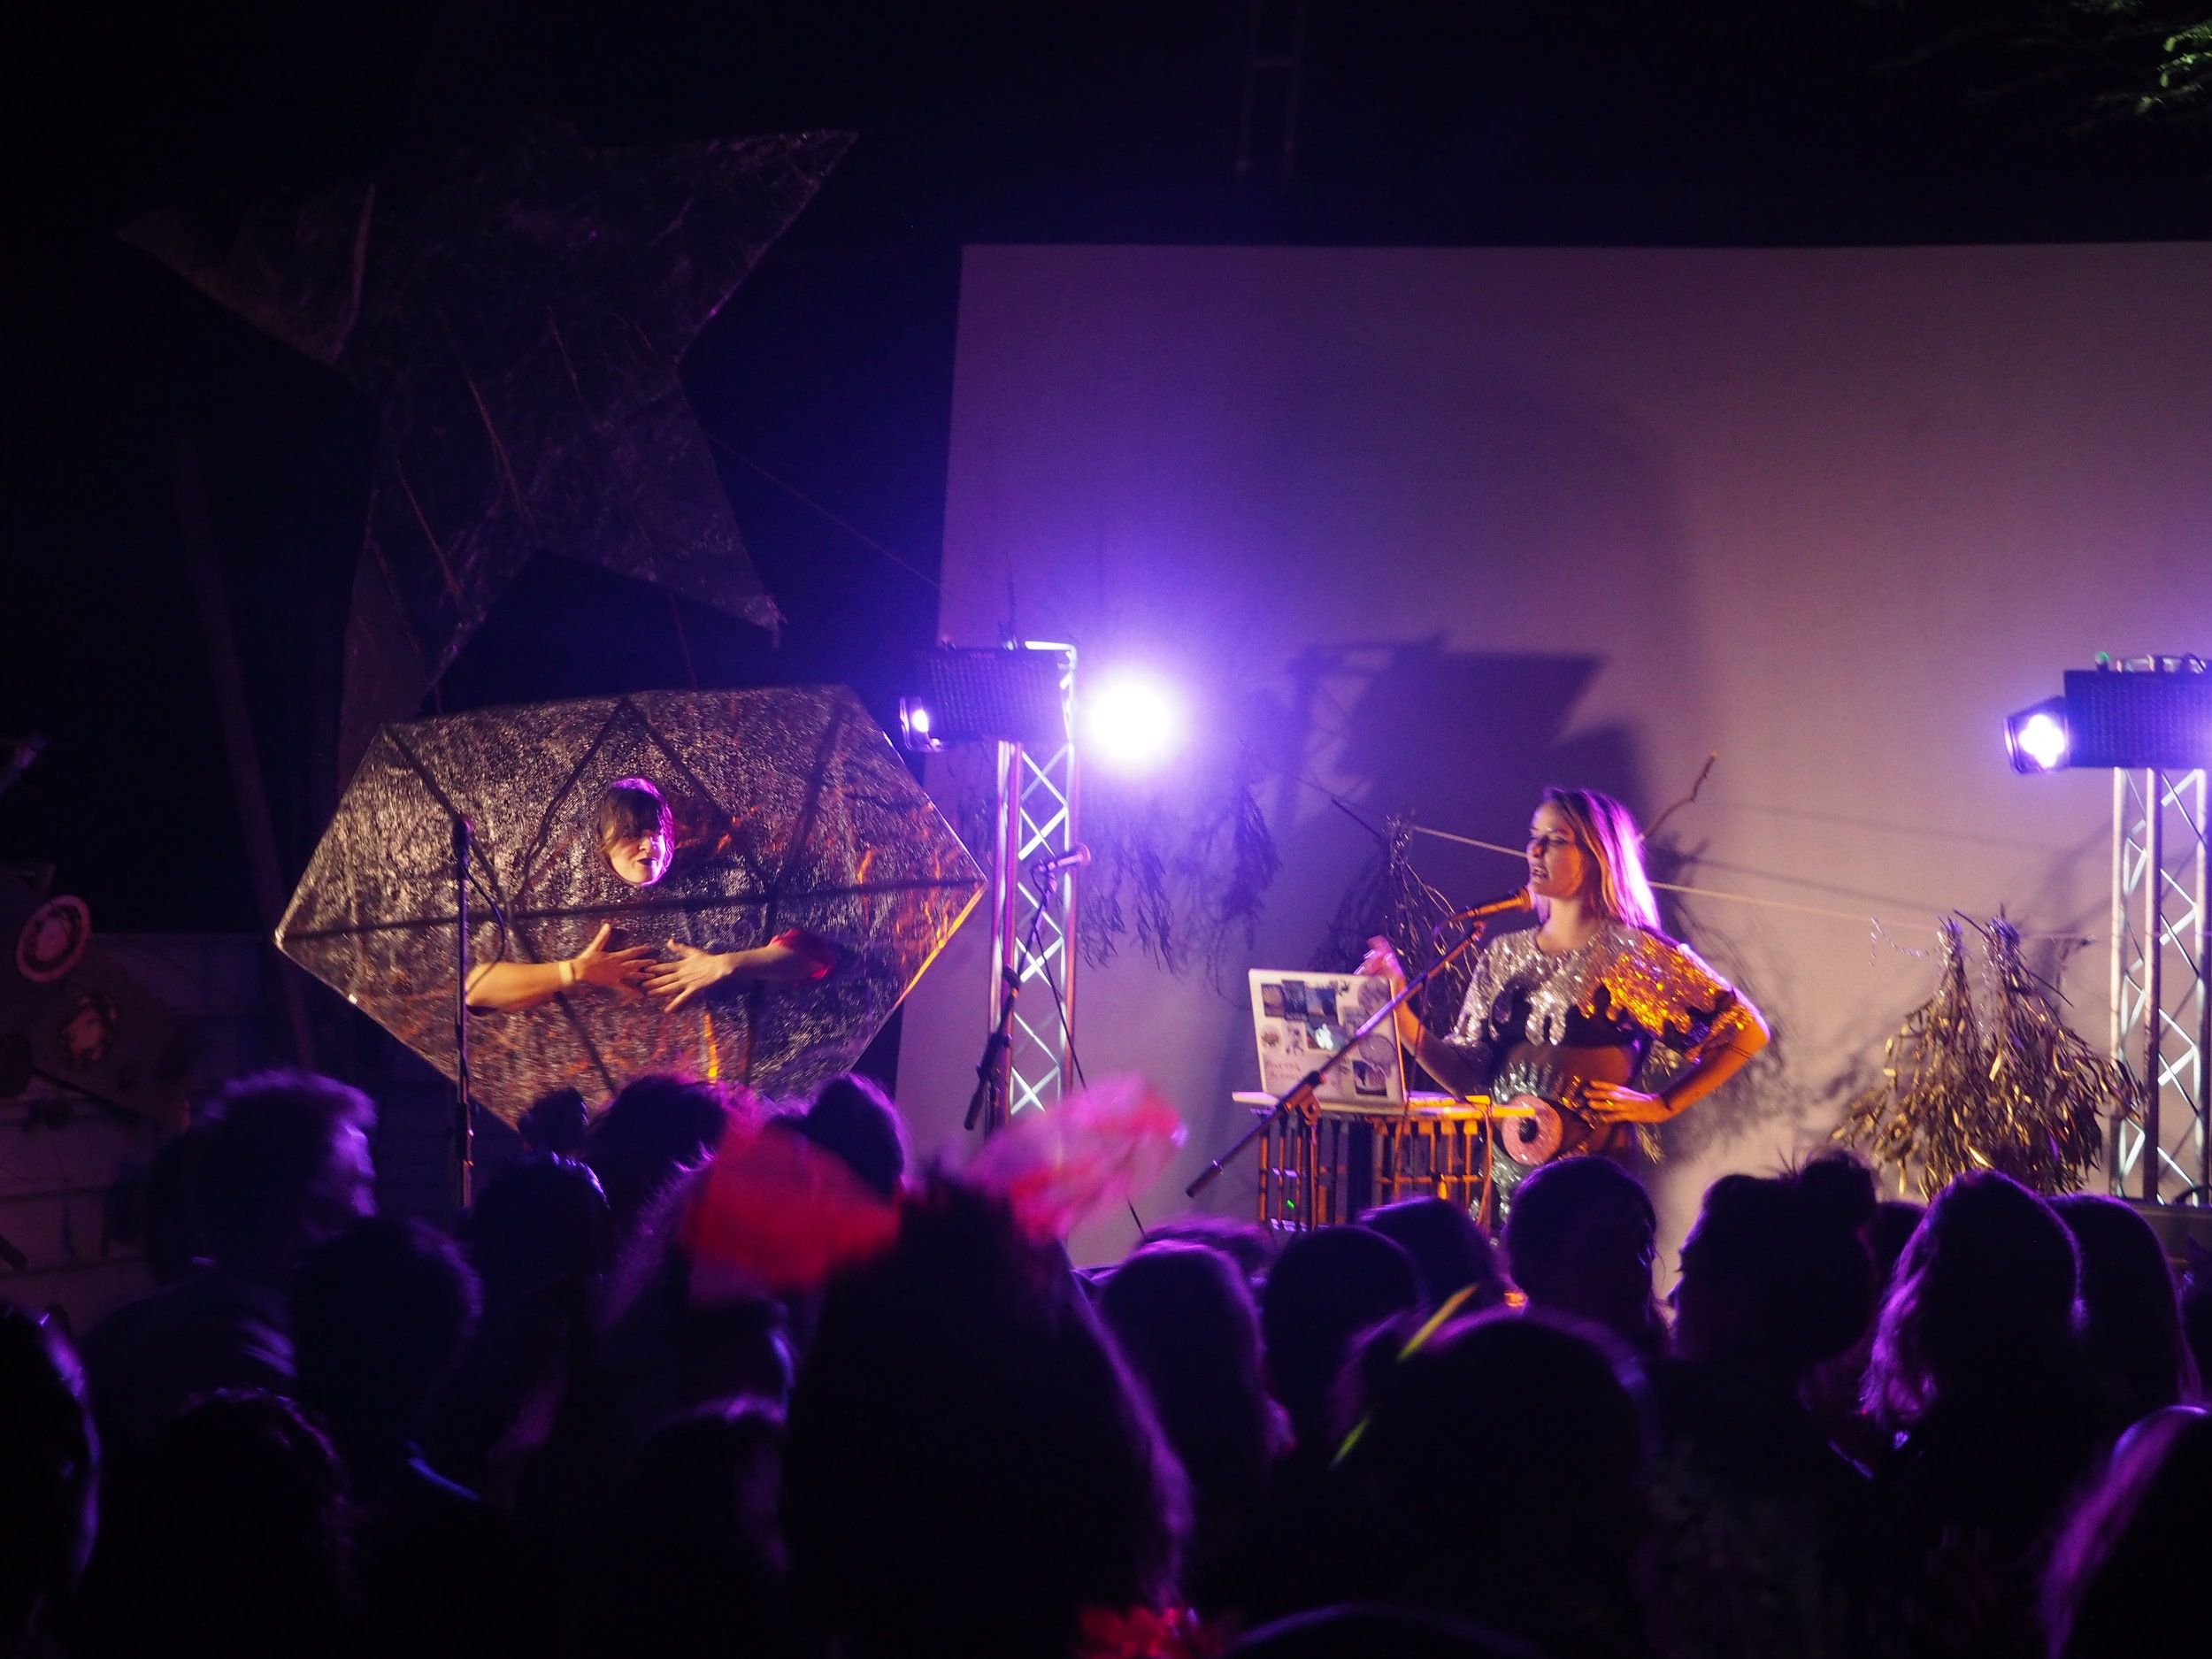 DJ Drazic's GF and The Diamond performing